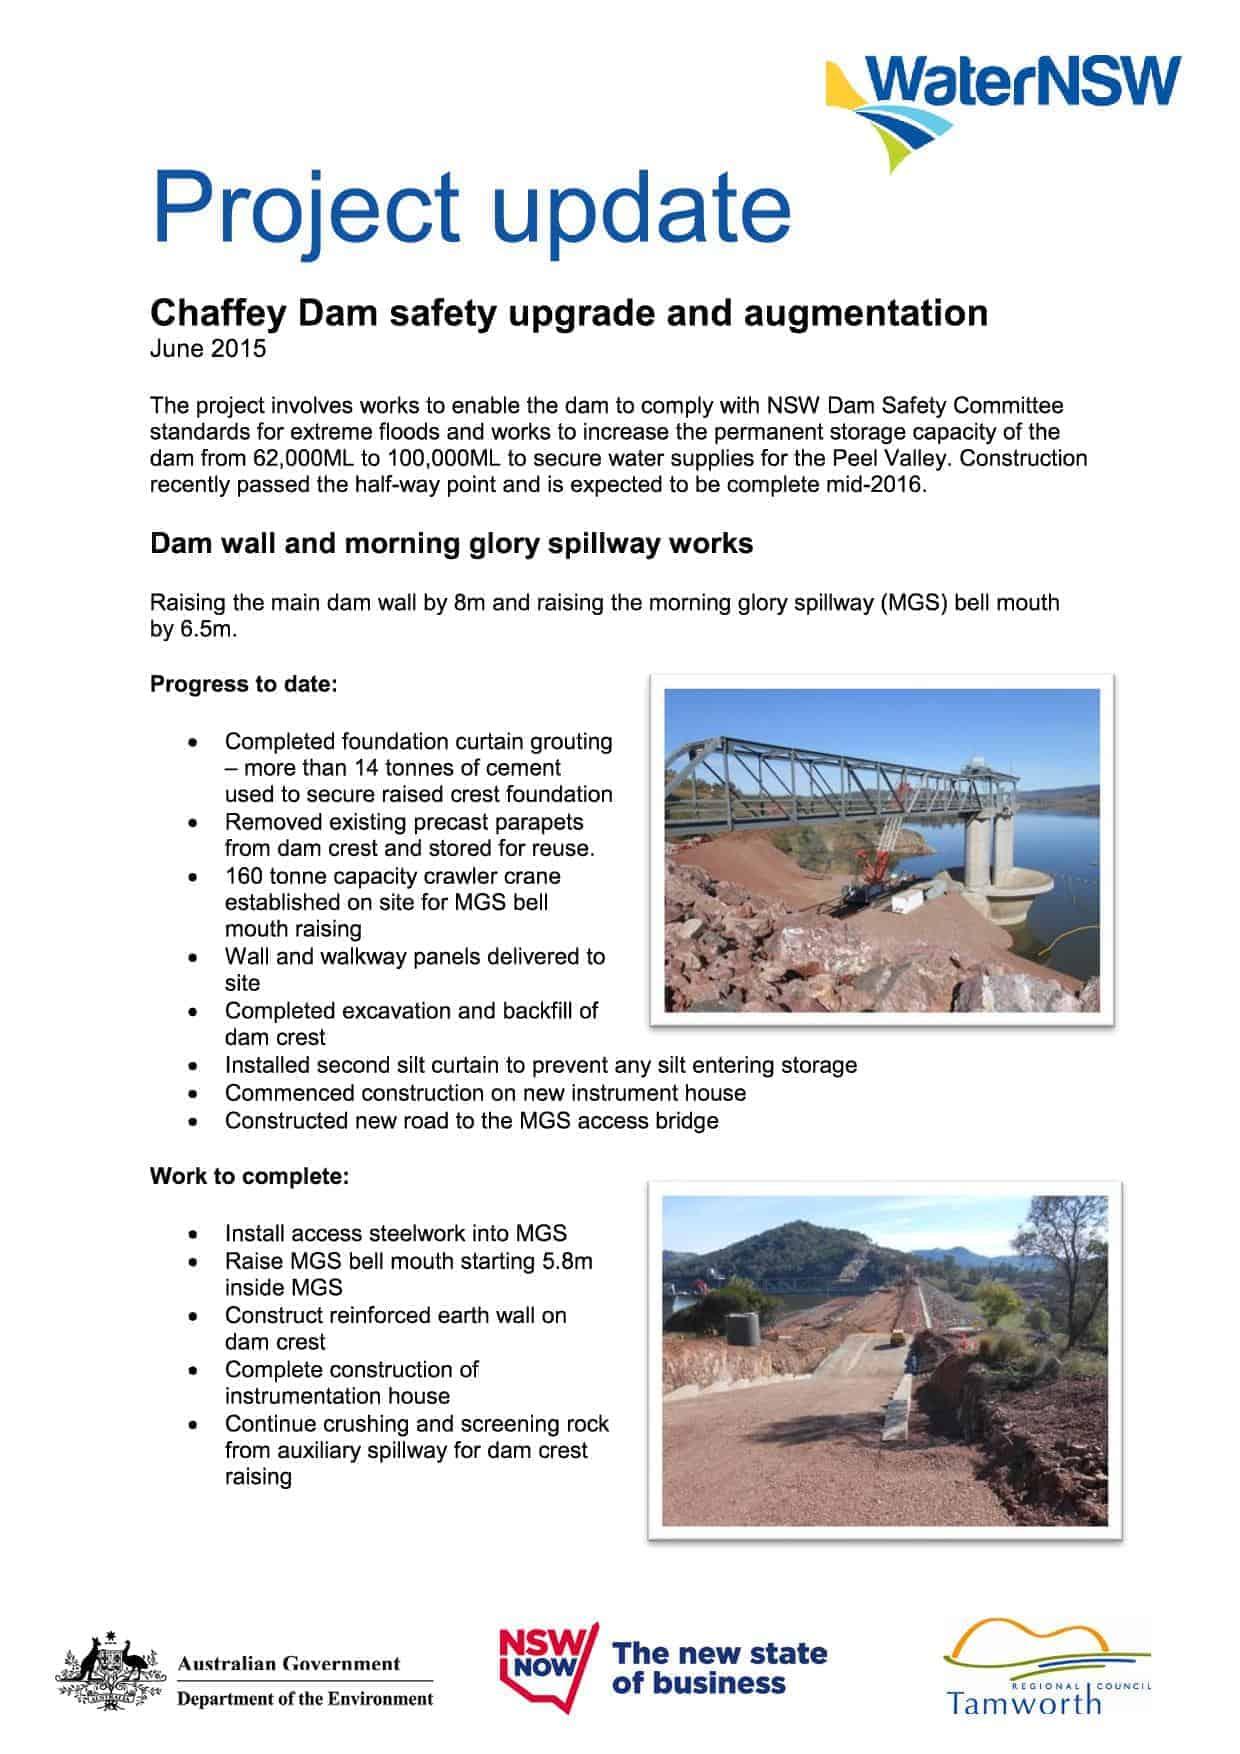 Chaffey project update June 20151